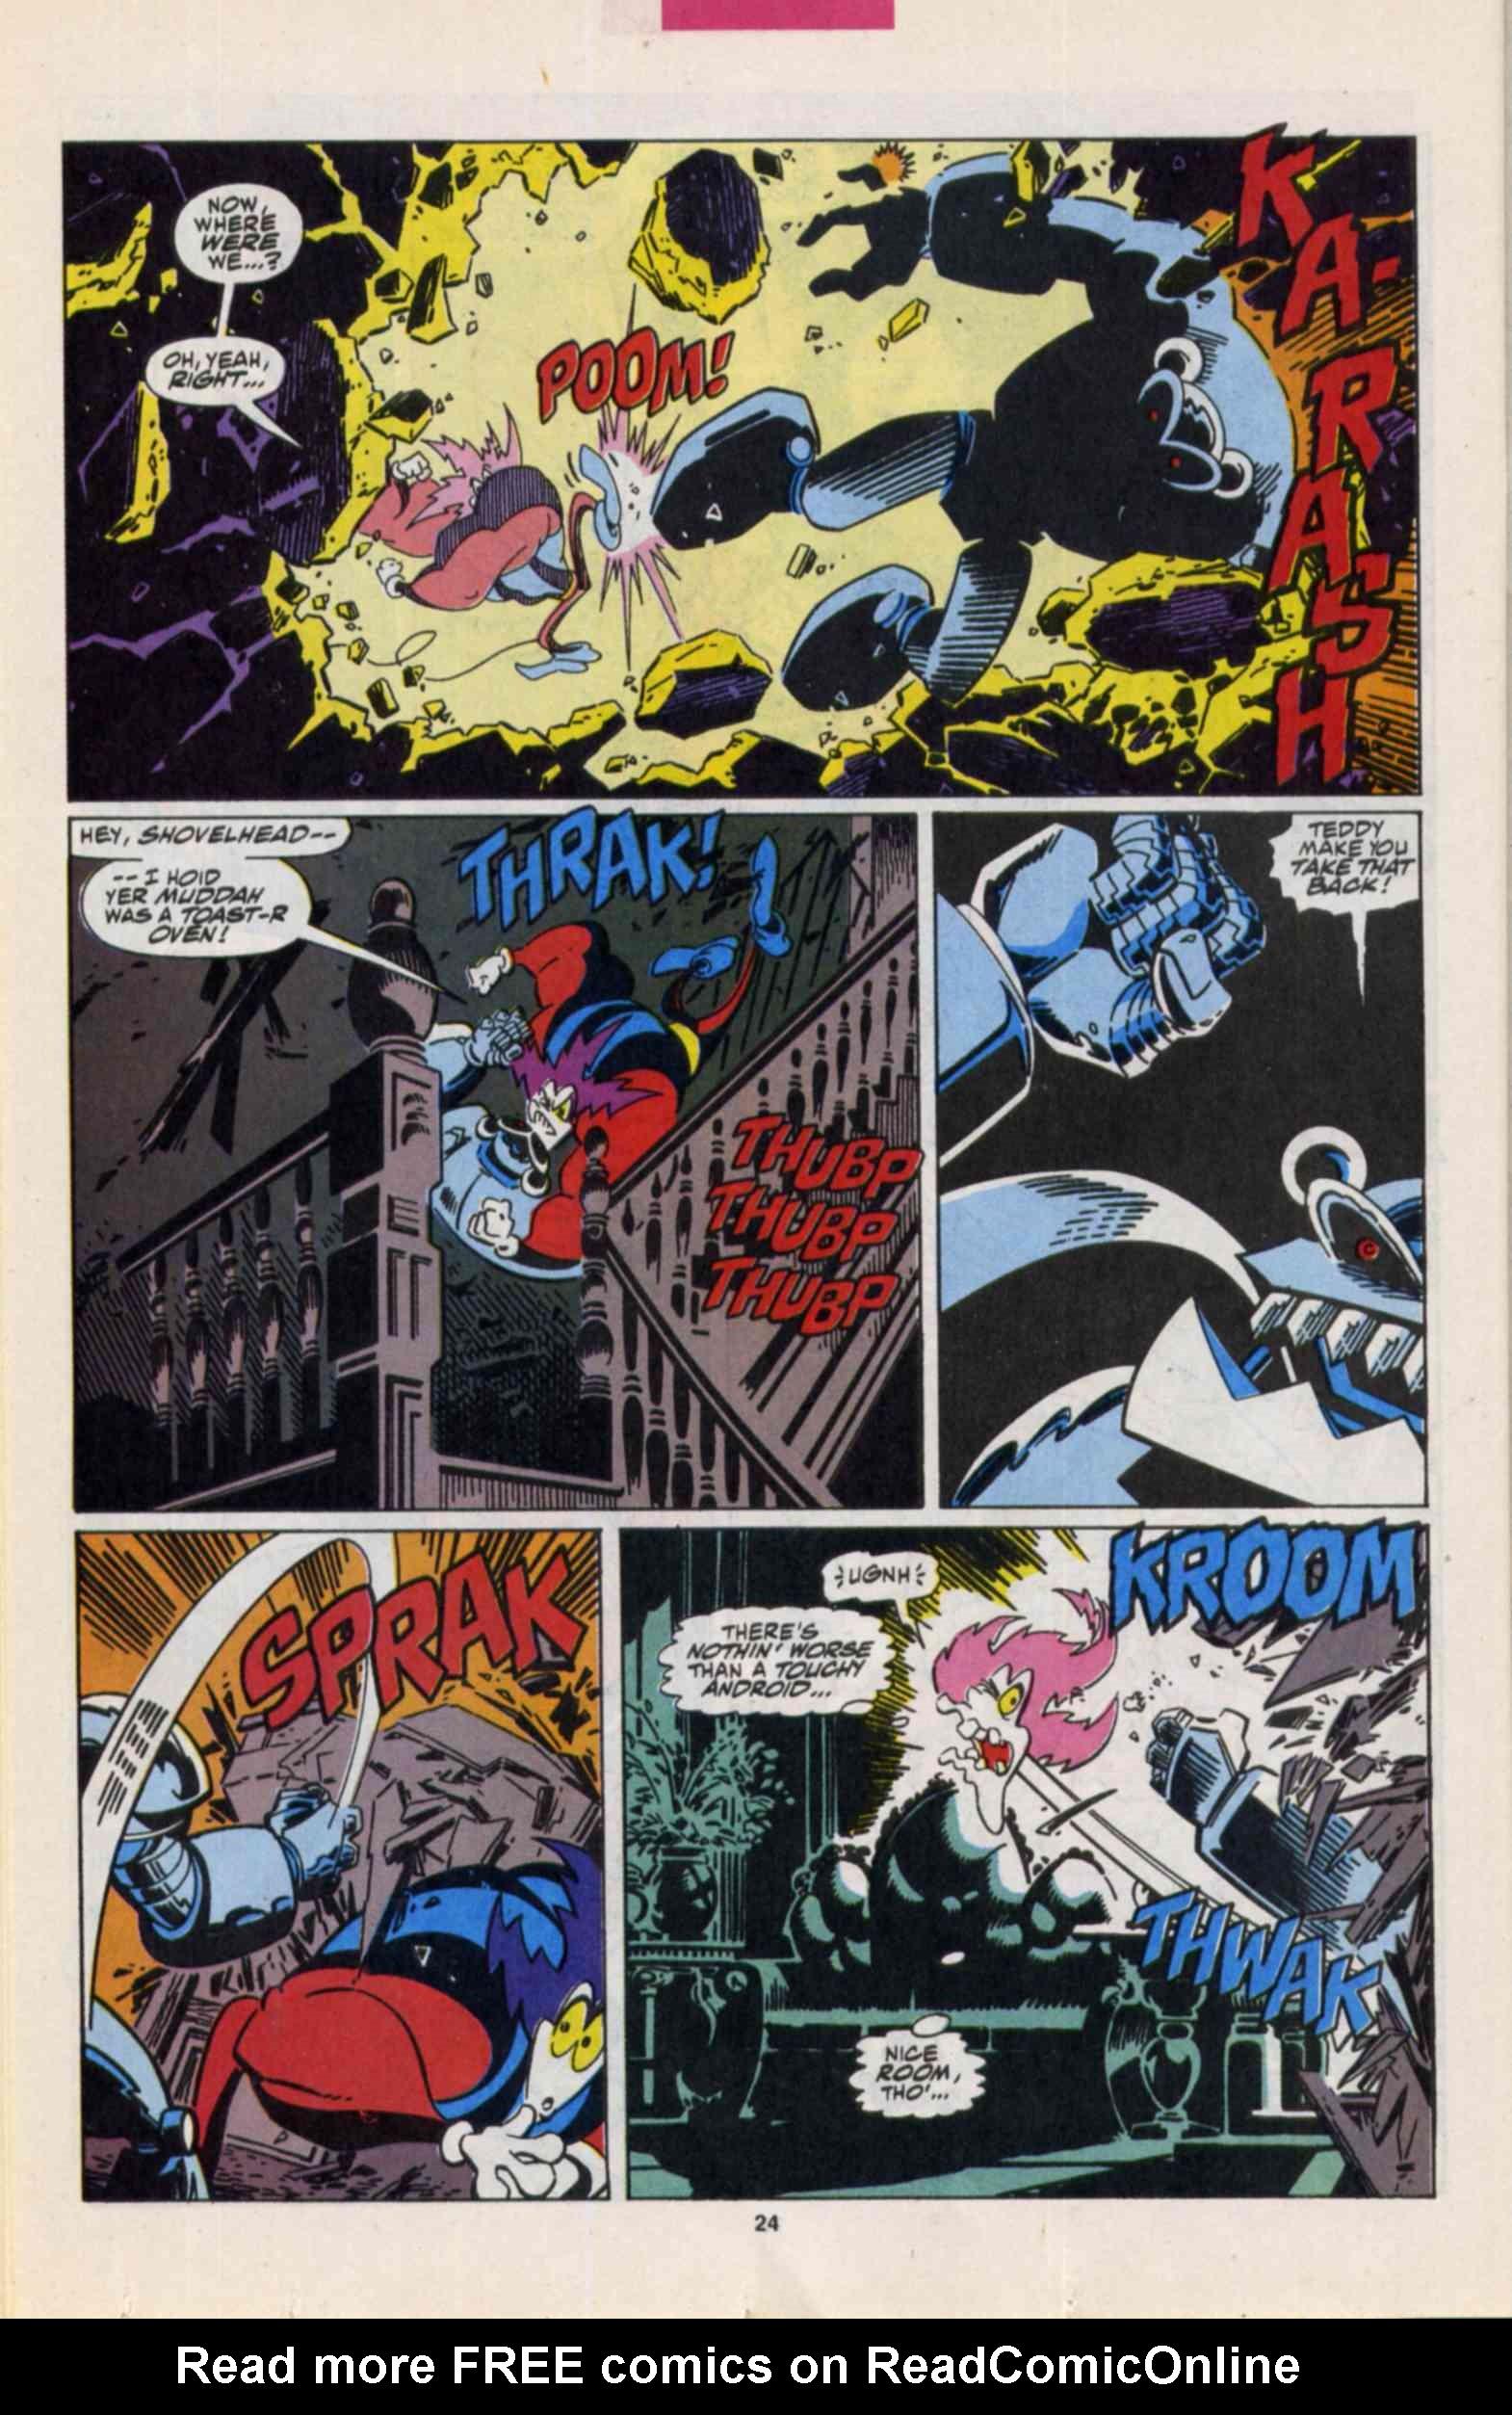 Read online Slapstick comic -  Issue #3 - 19